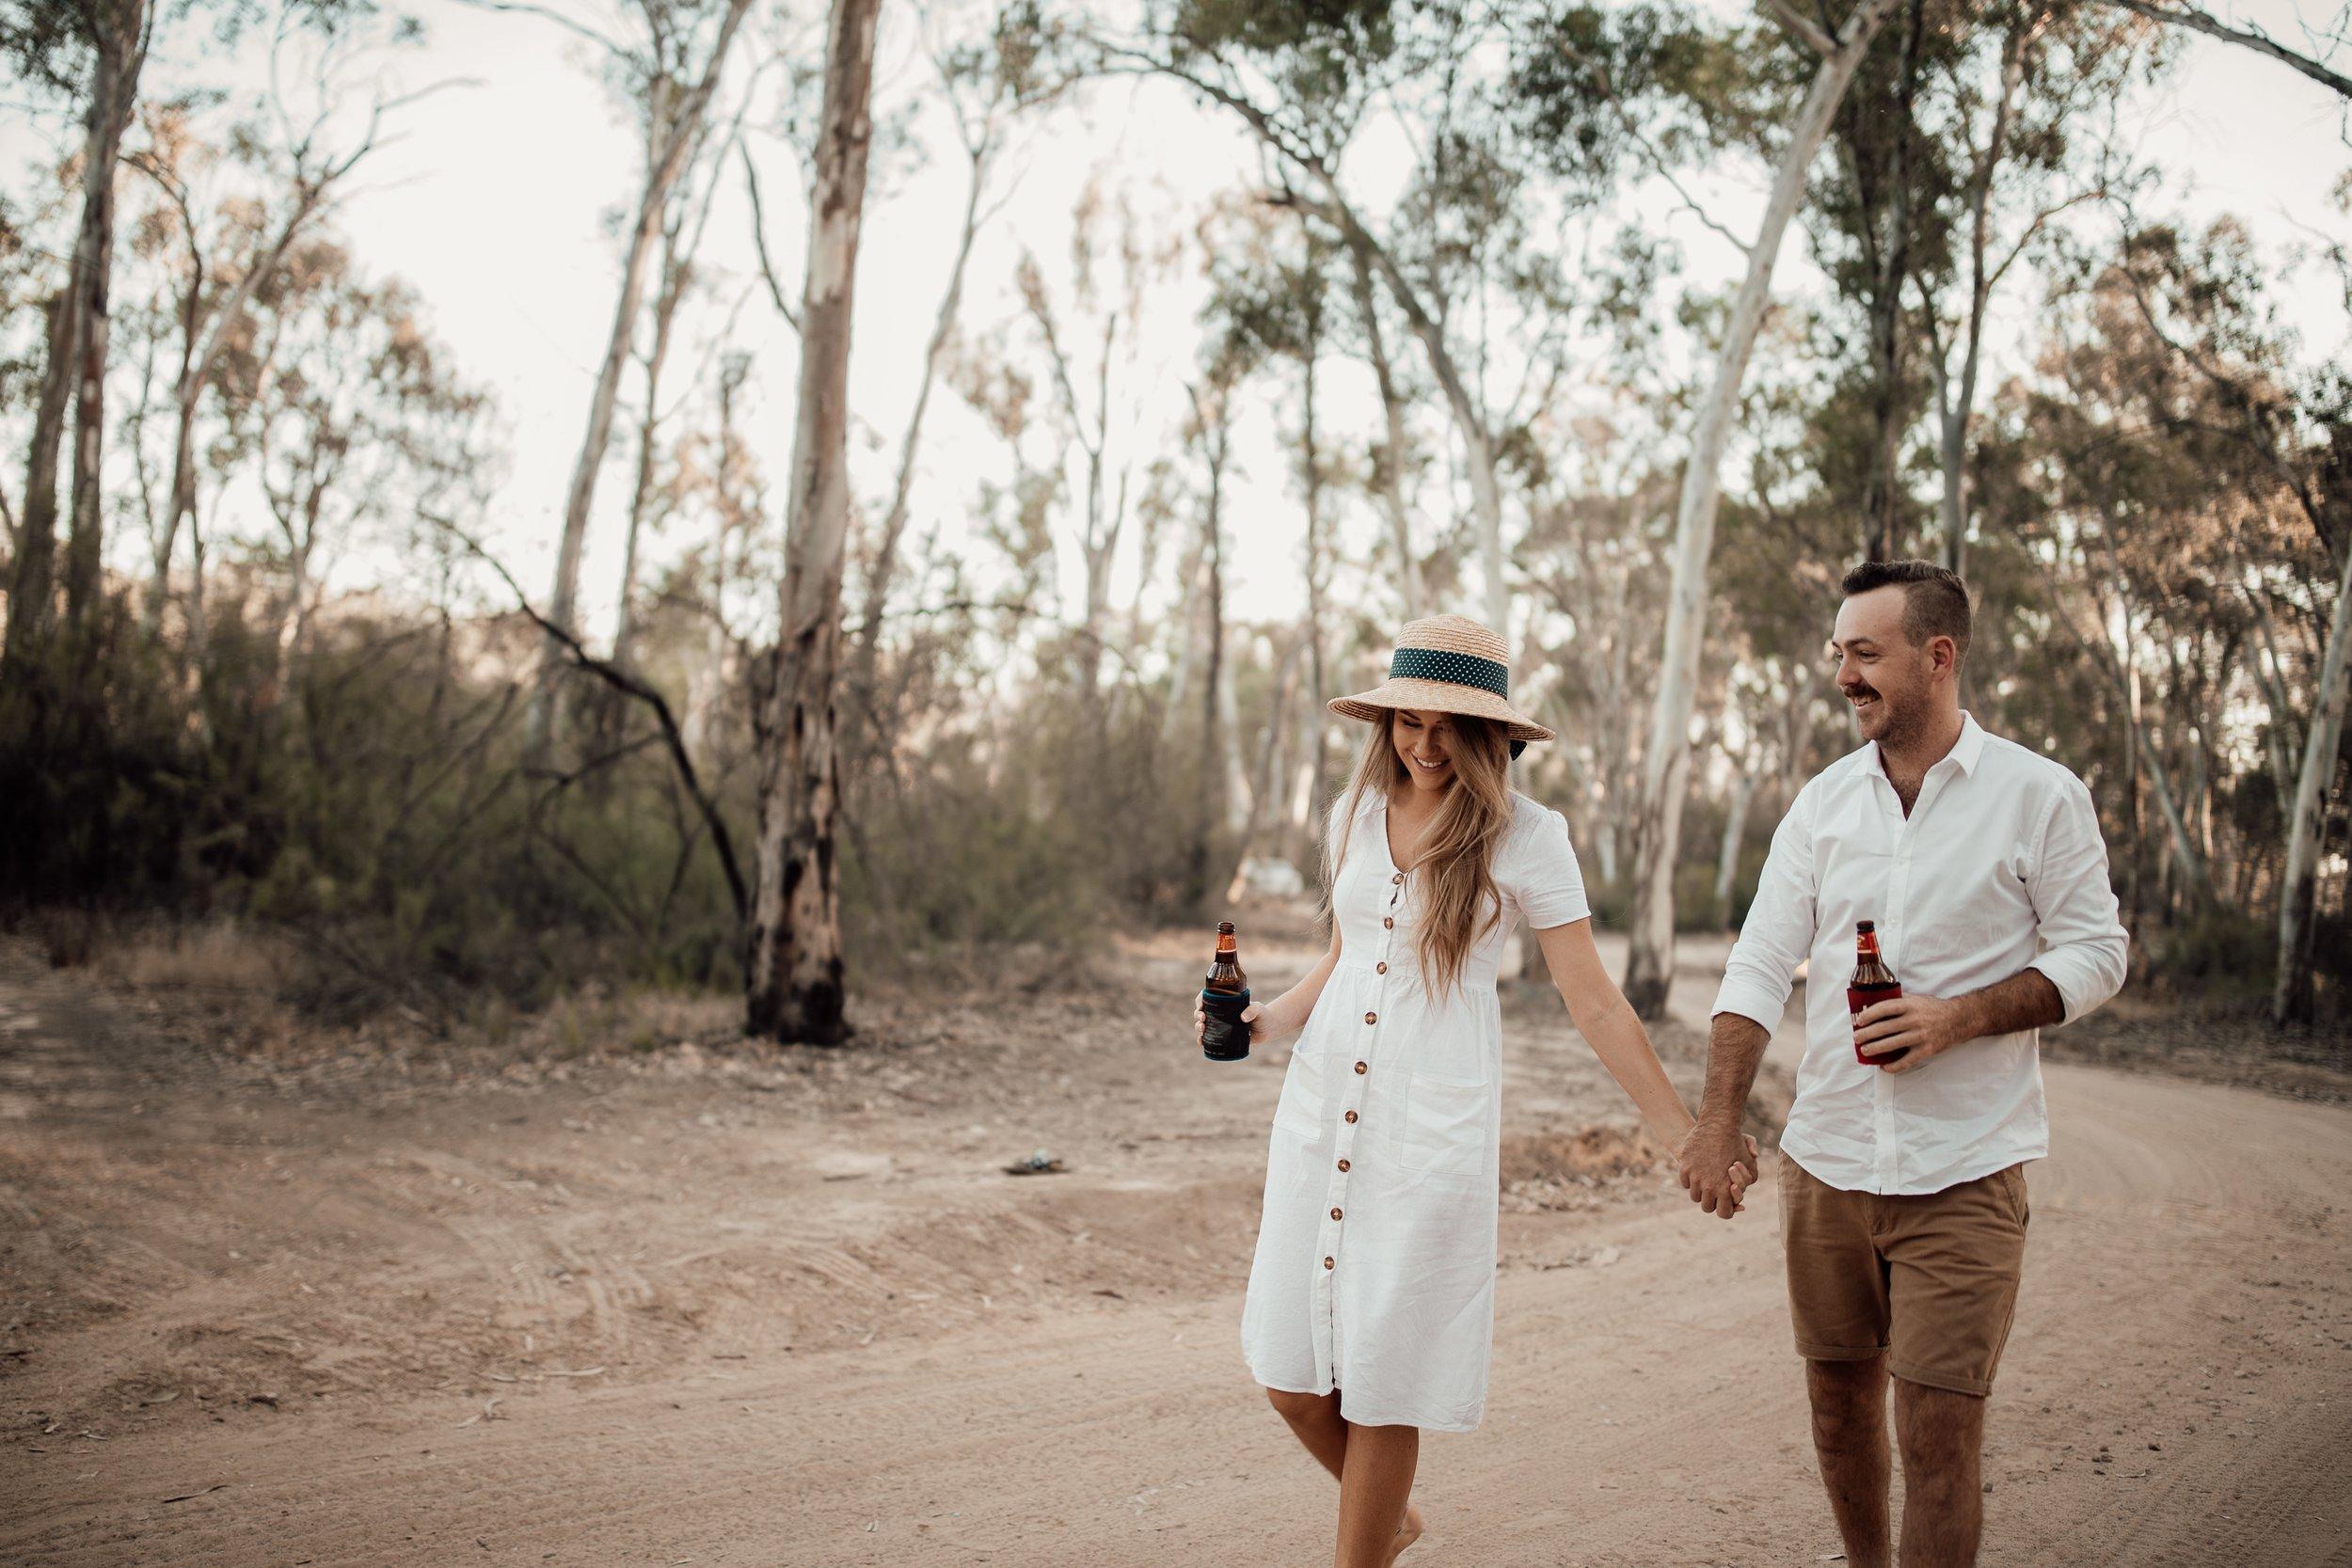 mickalathomas_puremacphotography_weddingphotographer_couplephotographer_Sheppartonphotographer_2810.jpg